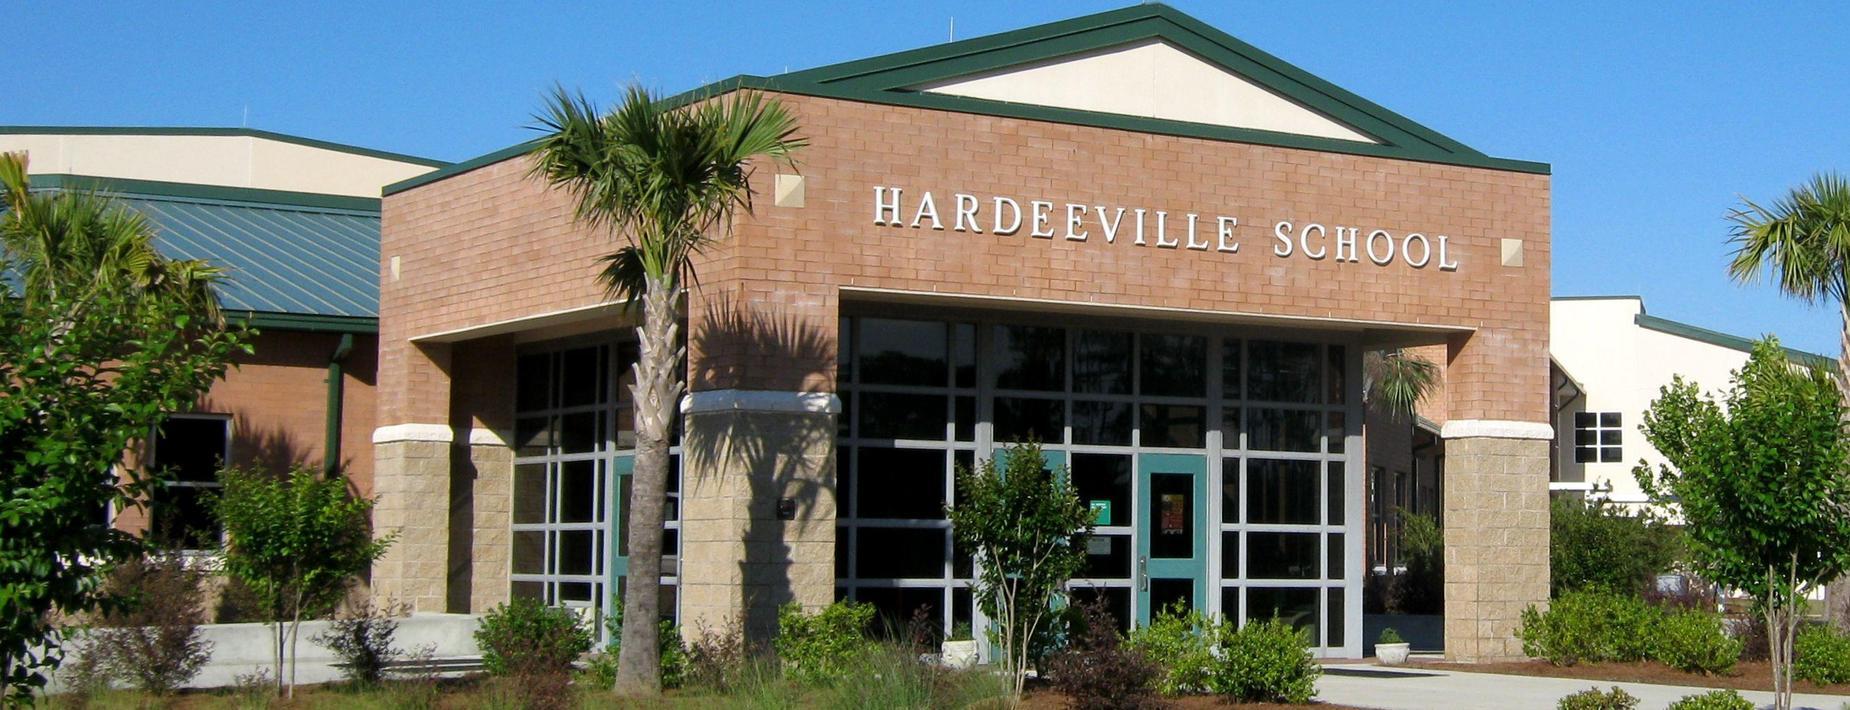 Hardeeville Campus image